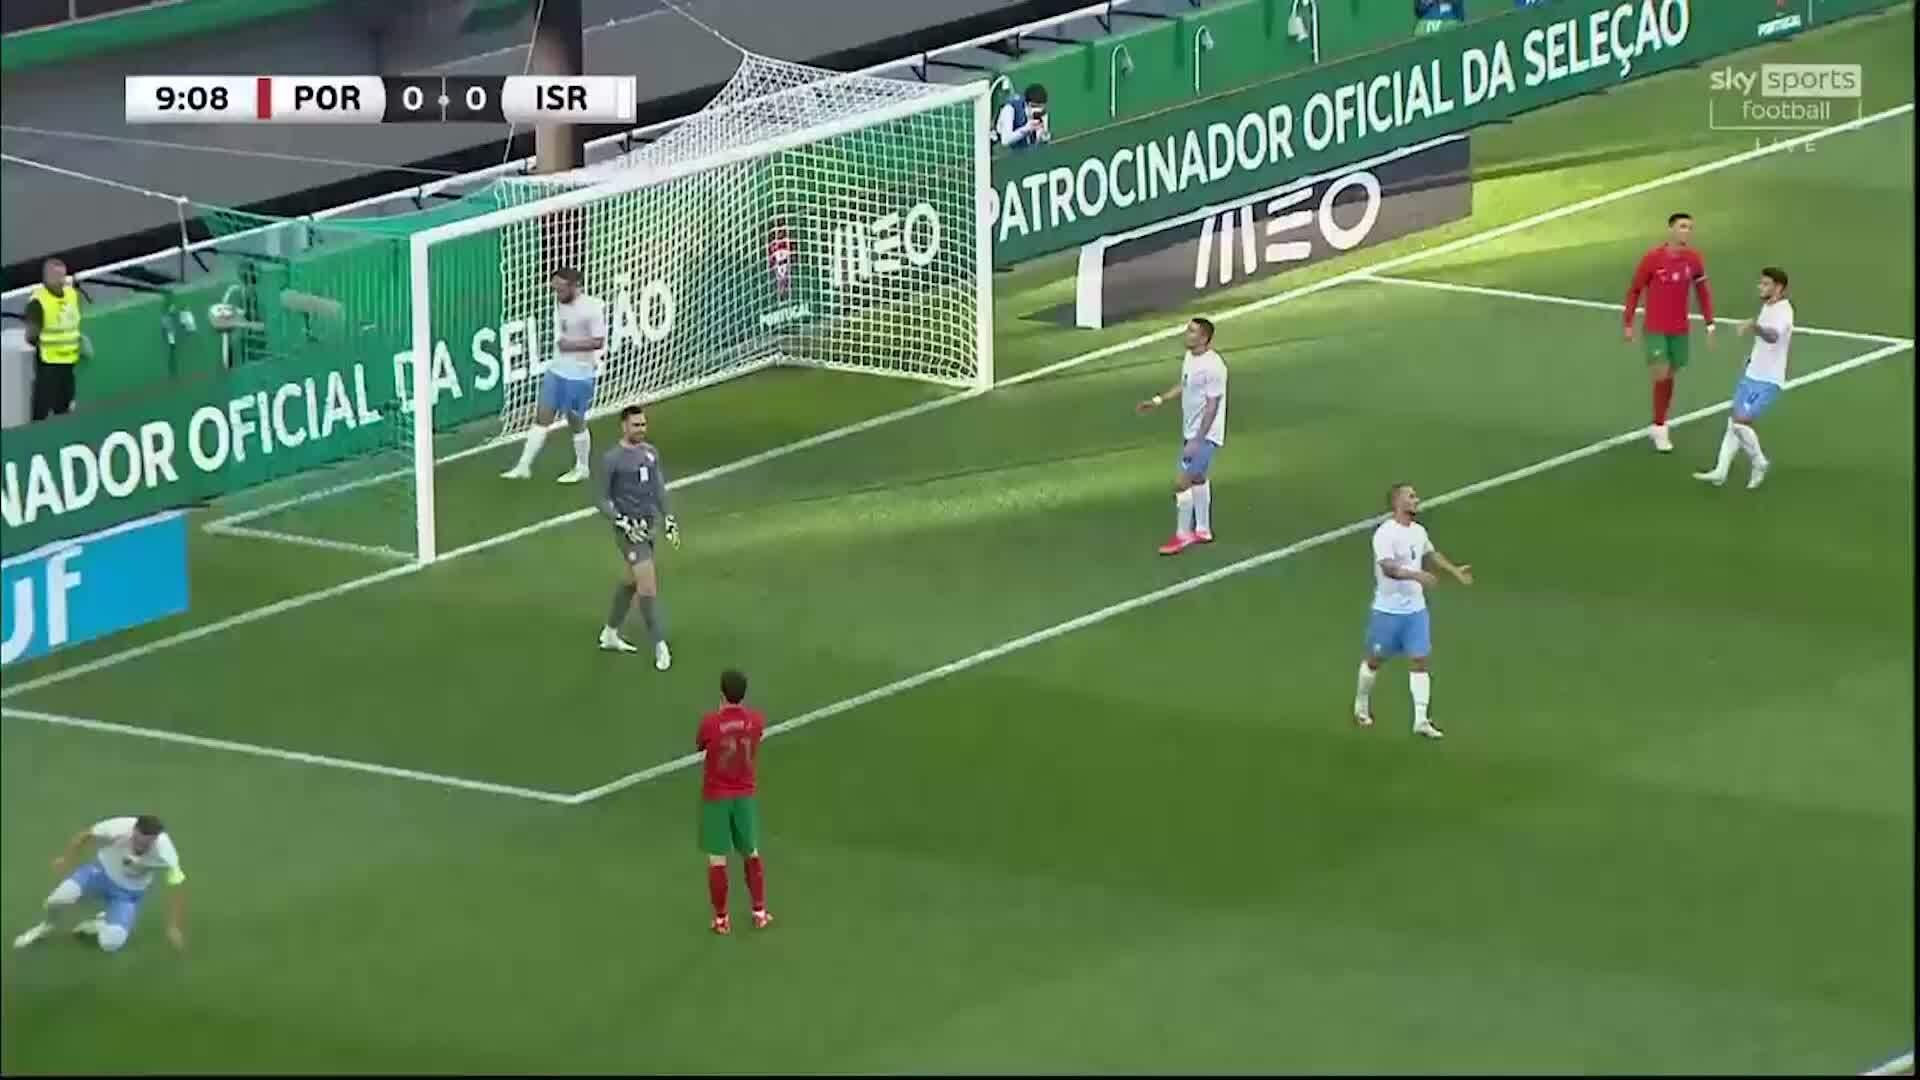 Bồ Đào Nha 4-0 Israel